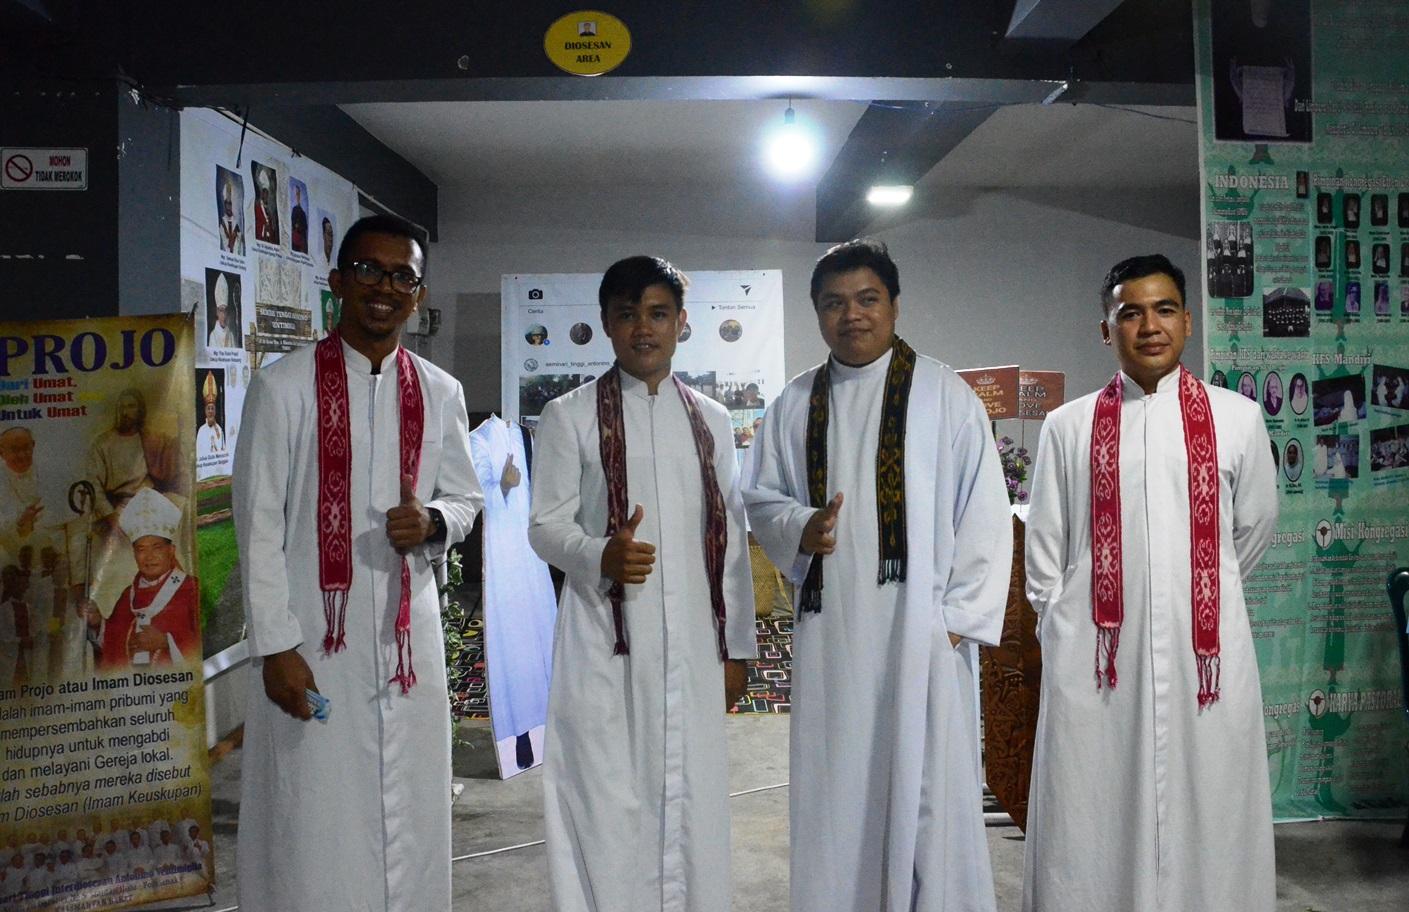 Parrocchia della Sacra Famiglia a Kota Baru, Pontianak (West Kalimantan) 03